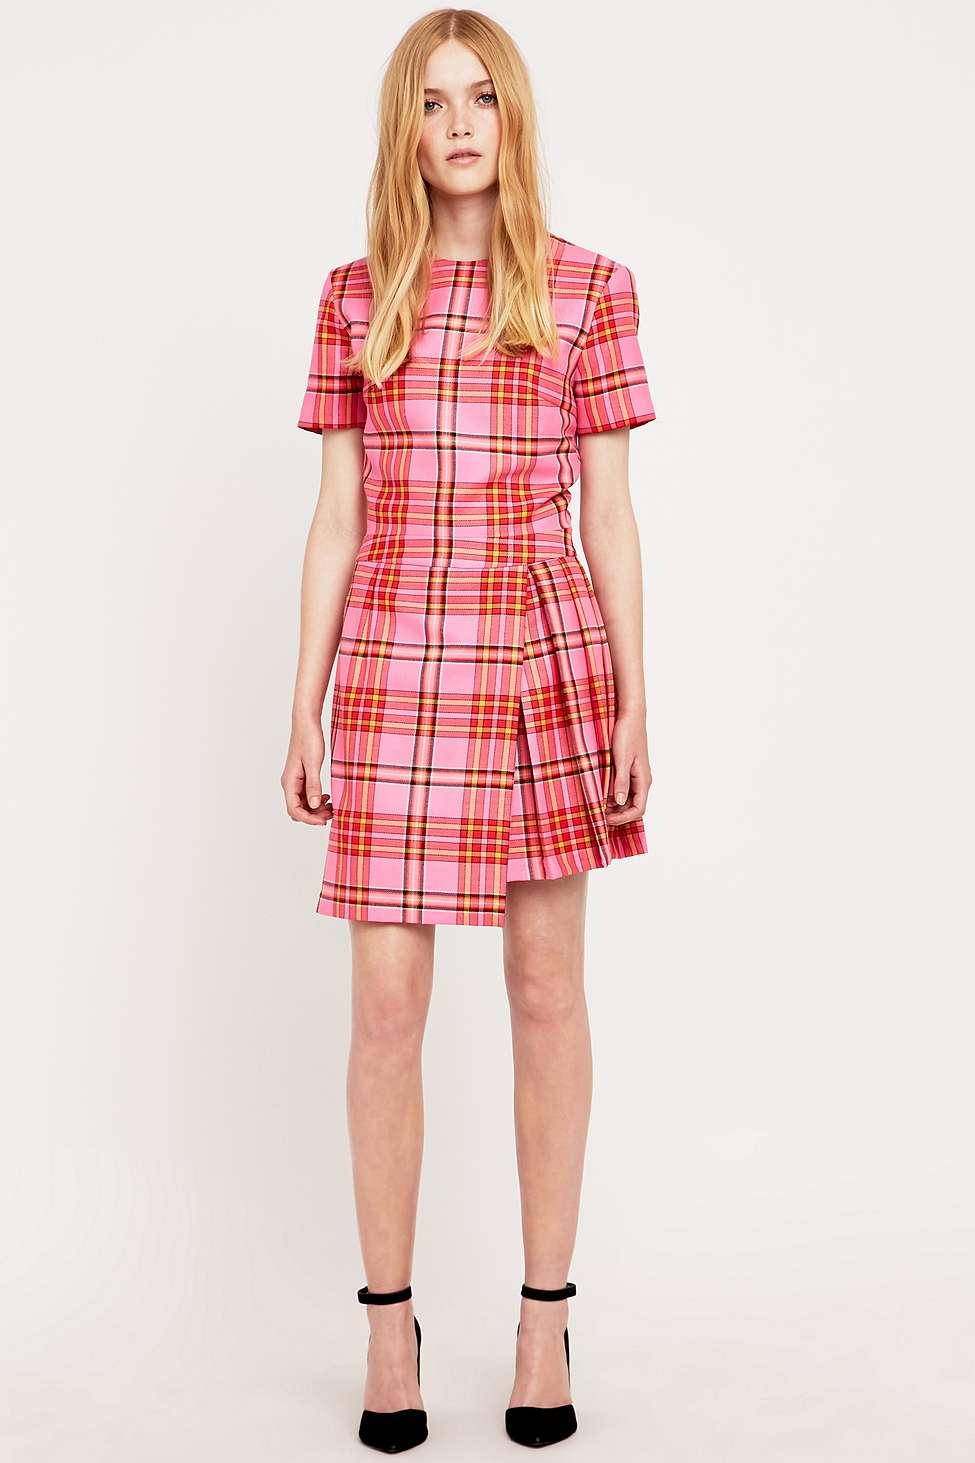 House of holland Pink Tartan Kilt Dress in Pink   Lyst